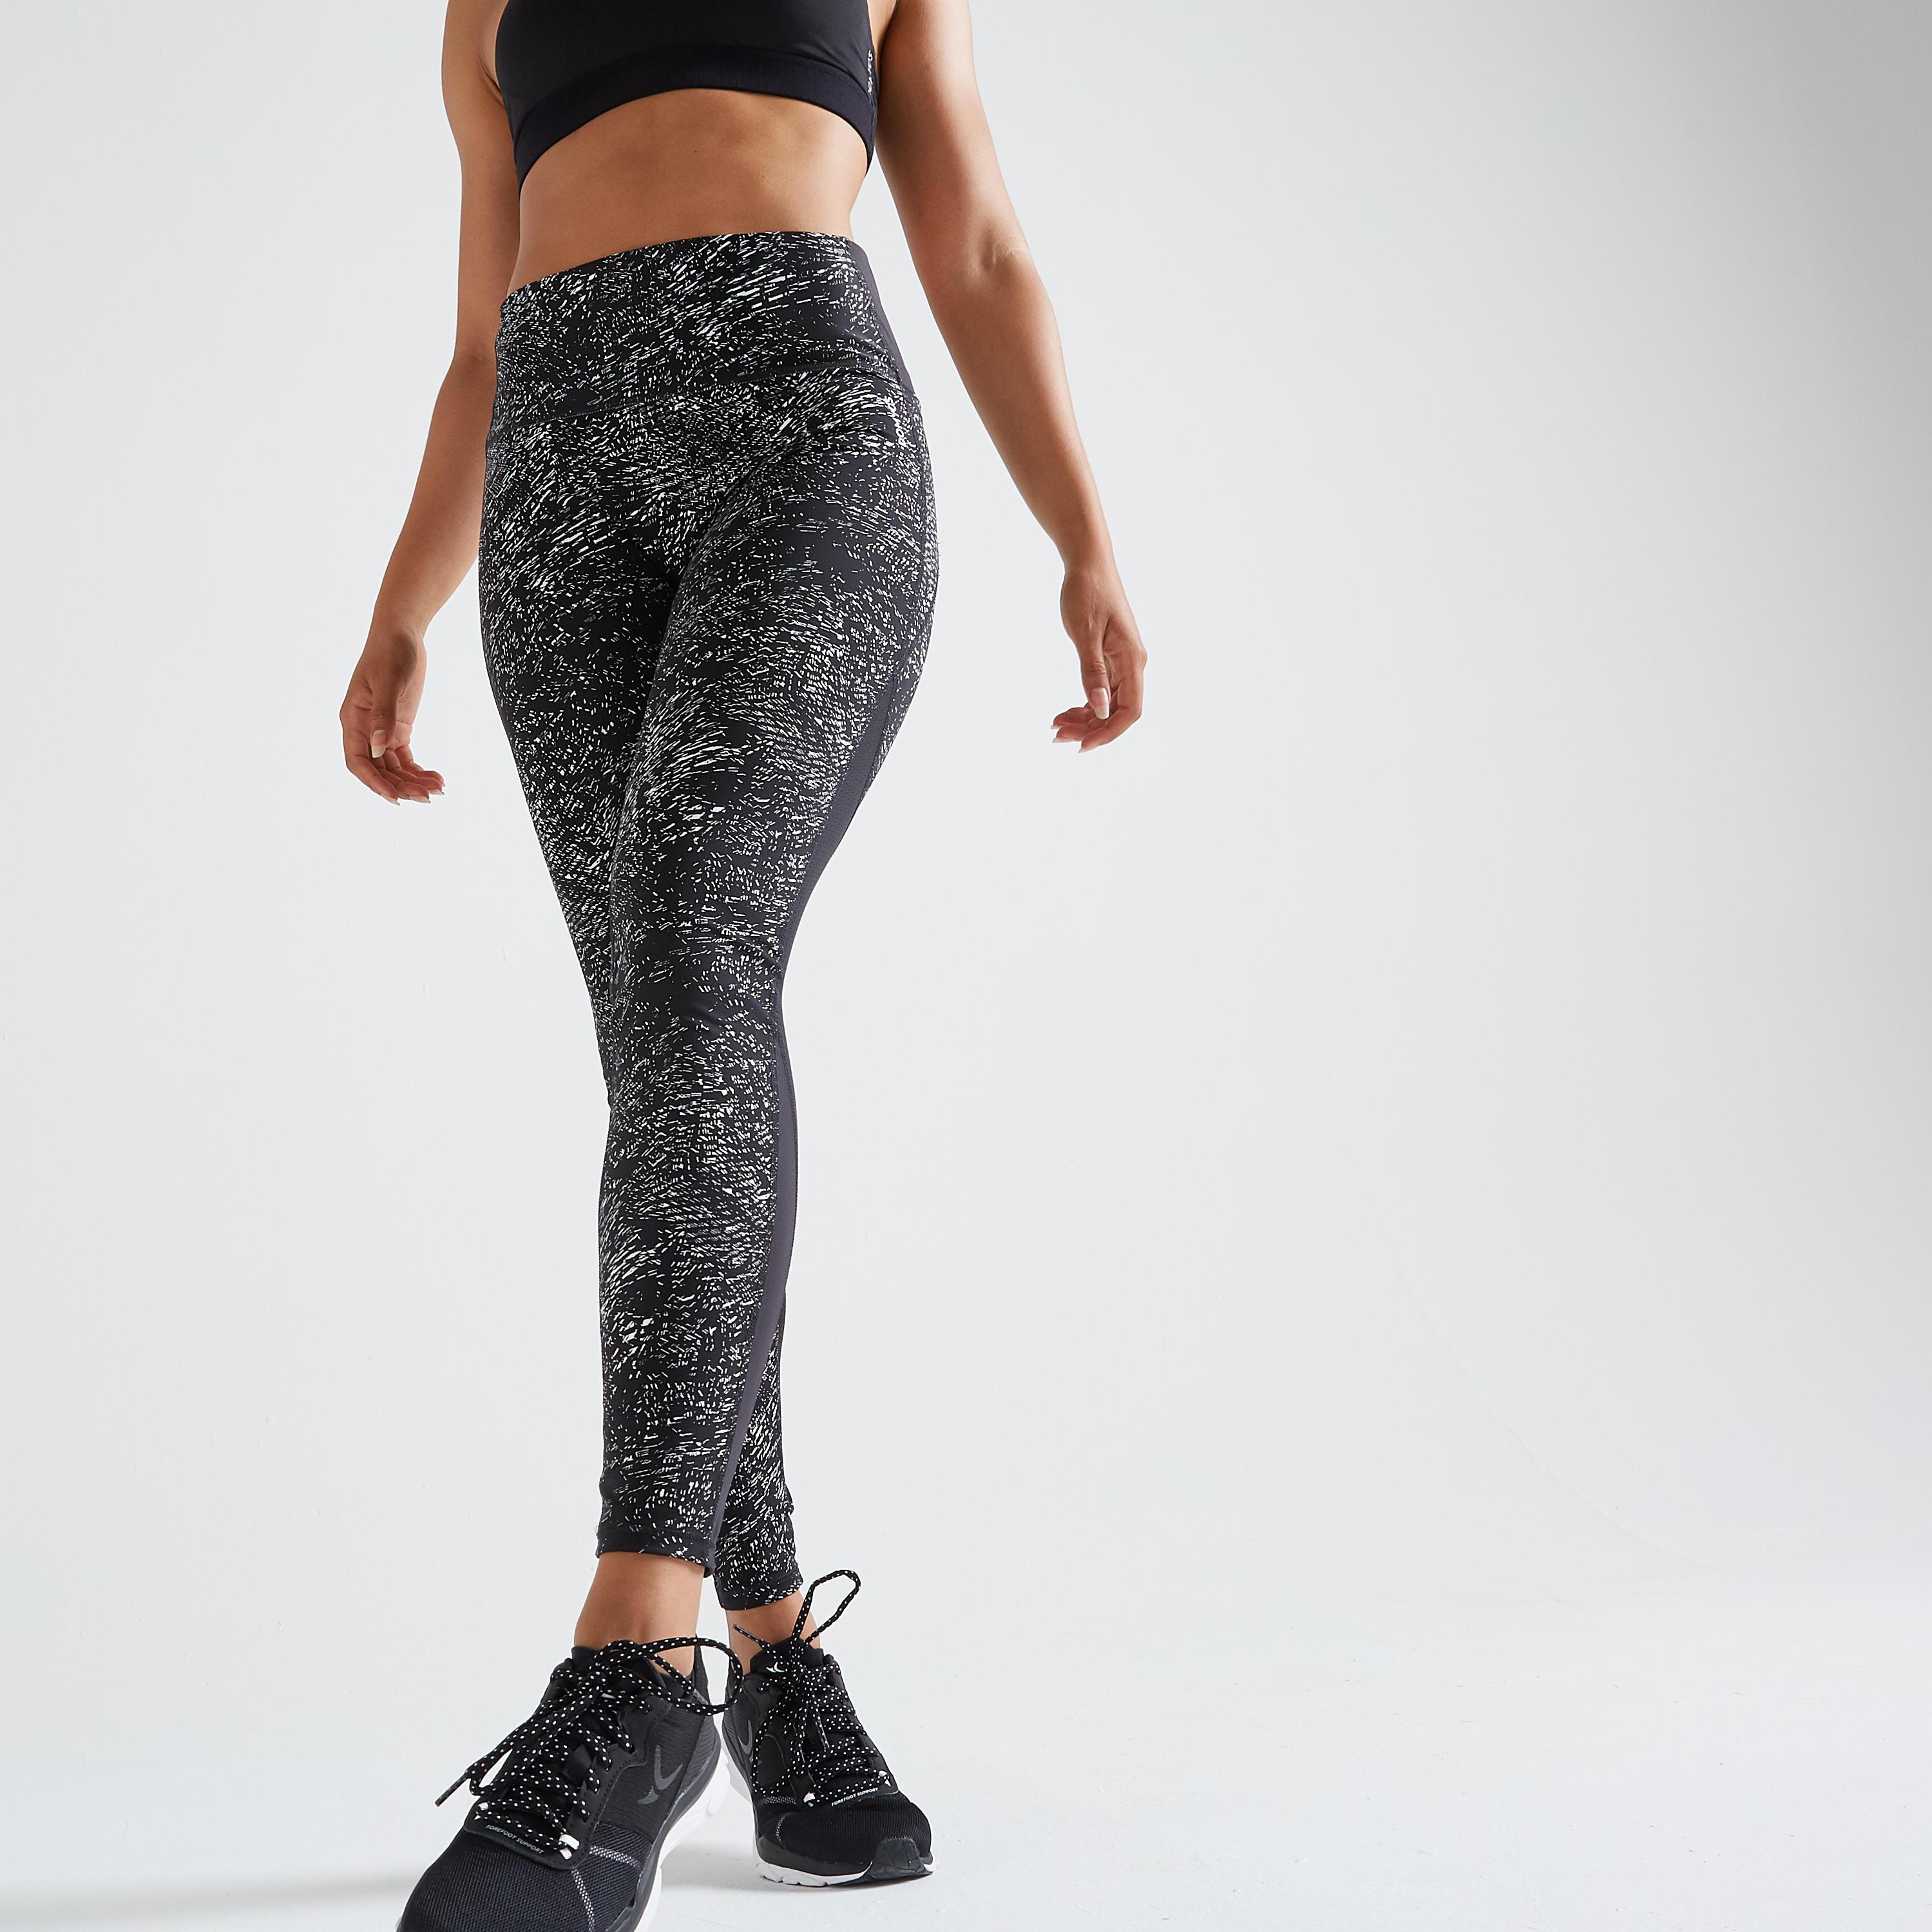 Colanți fitness 500 Damă